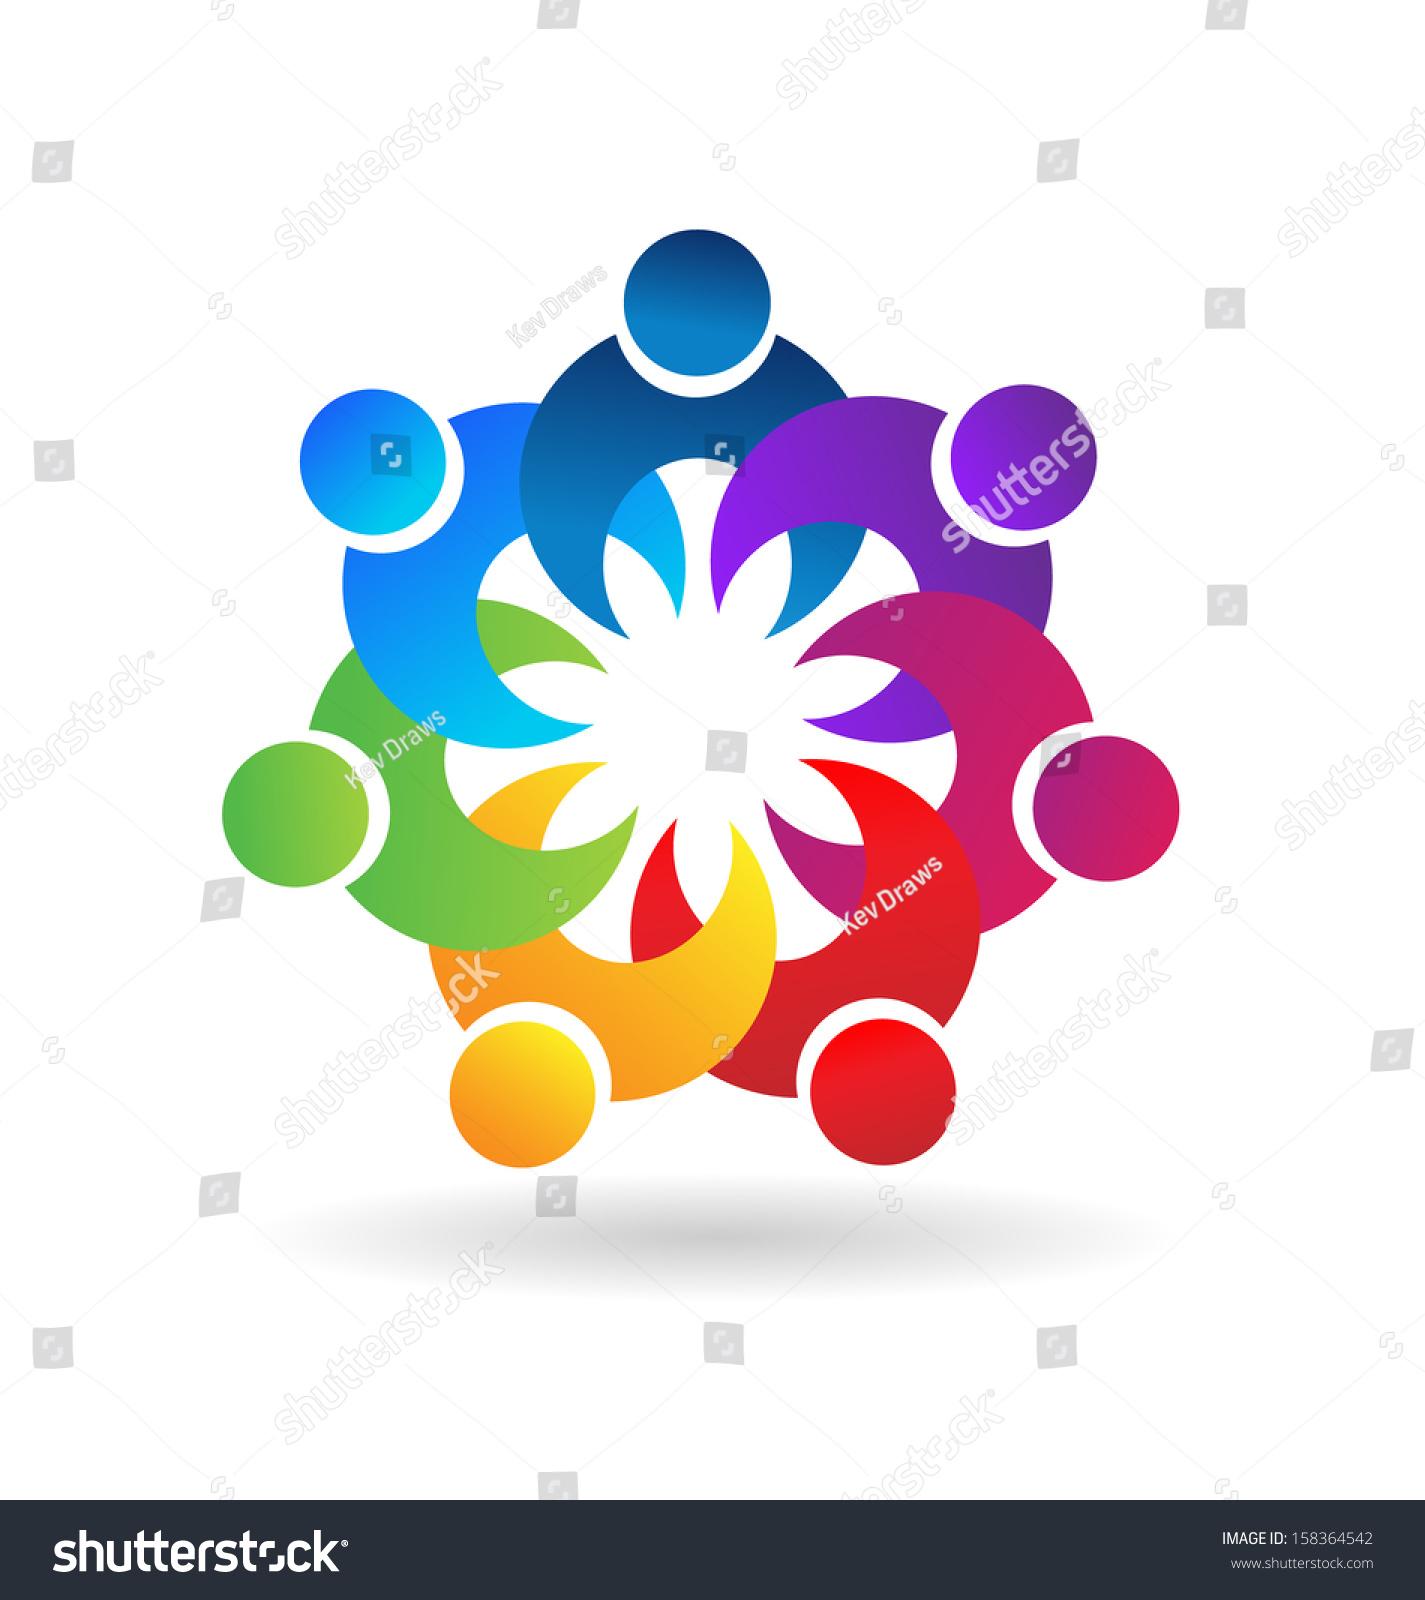 Teamwork Holding Hands Symbol Vector - 158364542 ...